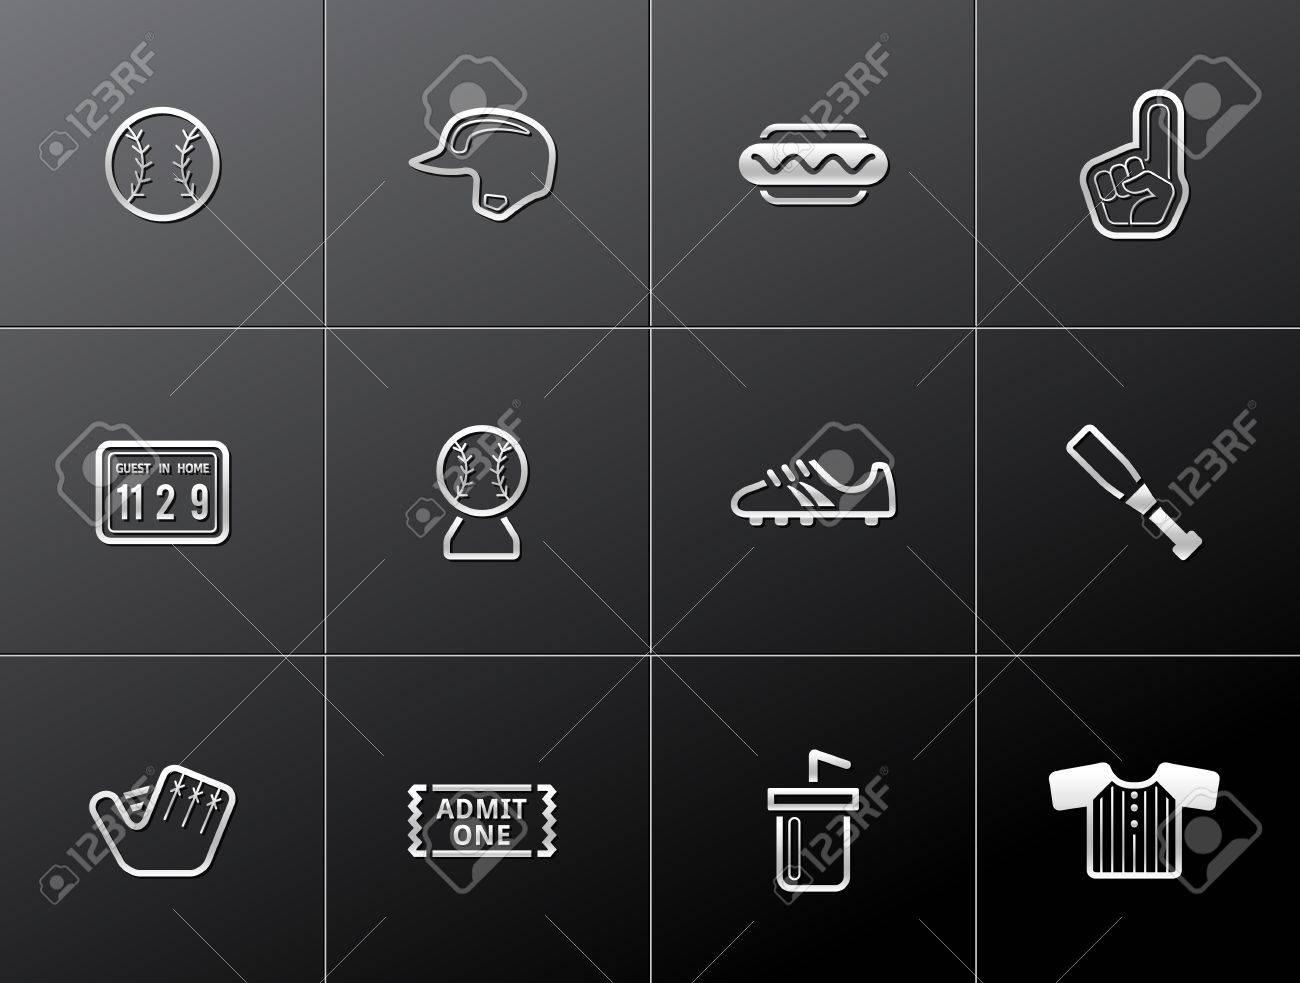 Baseball related icons in metallic style Stock Vector - 17233561